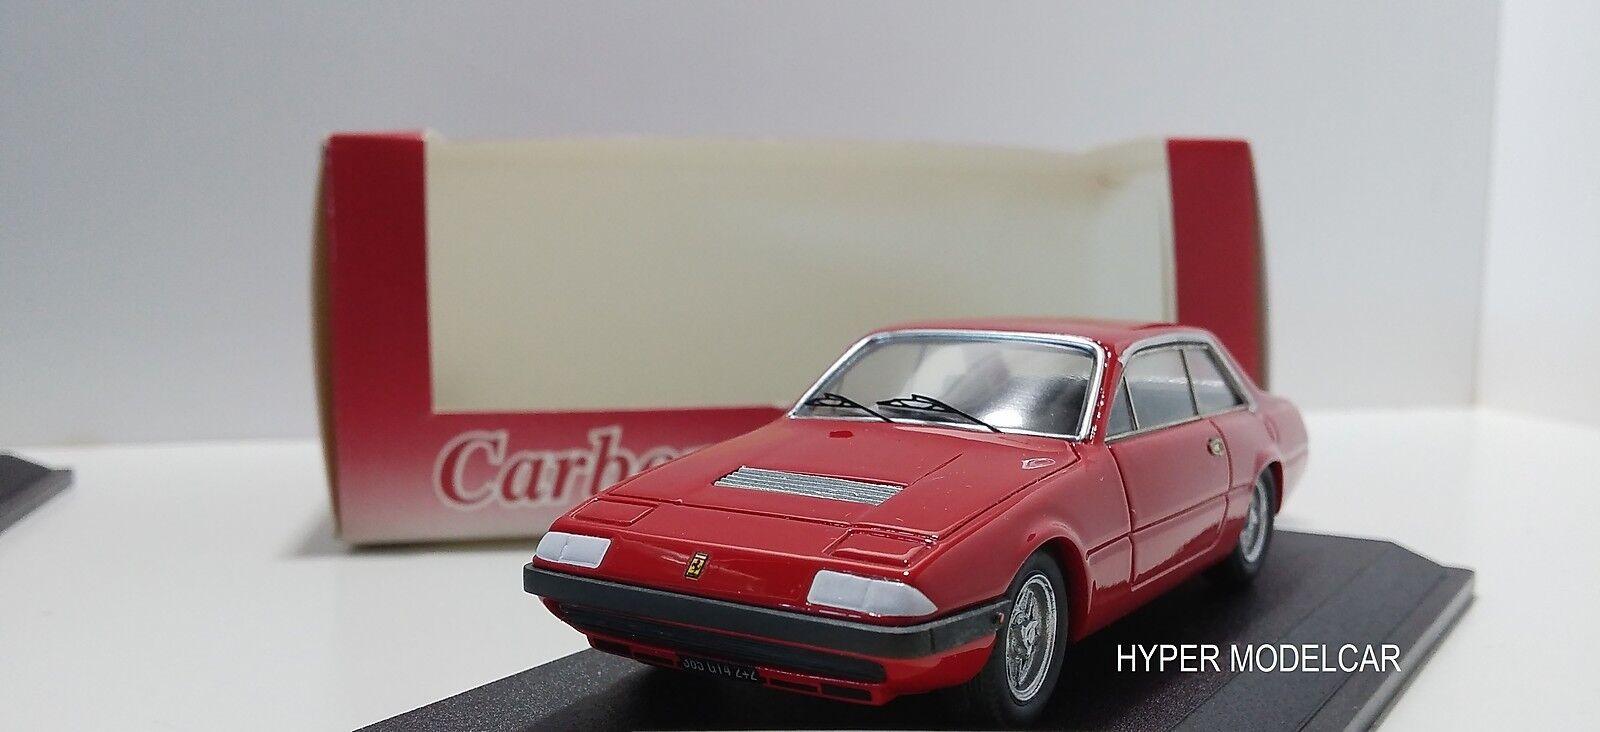 CARBONE 1 43 Ferrari 365 GT4 2+2 1976 rouge Art. CAR004R